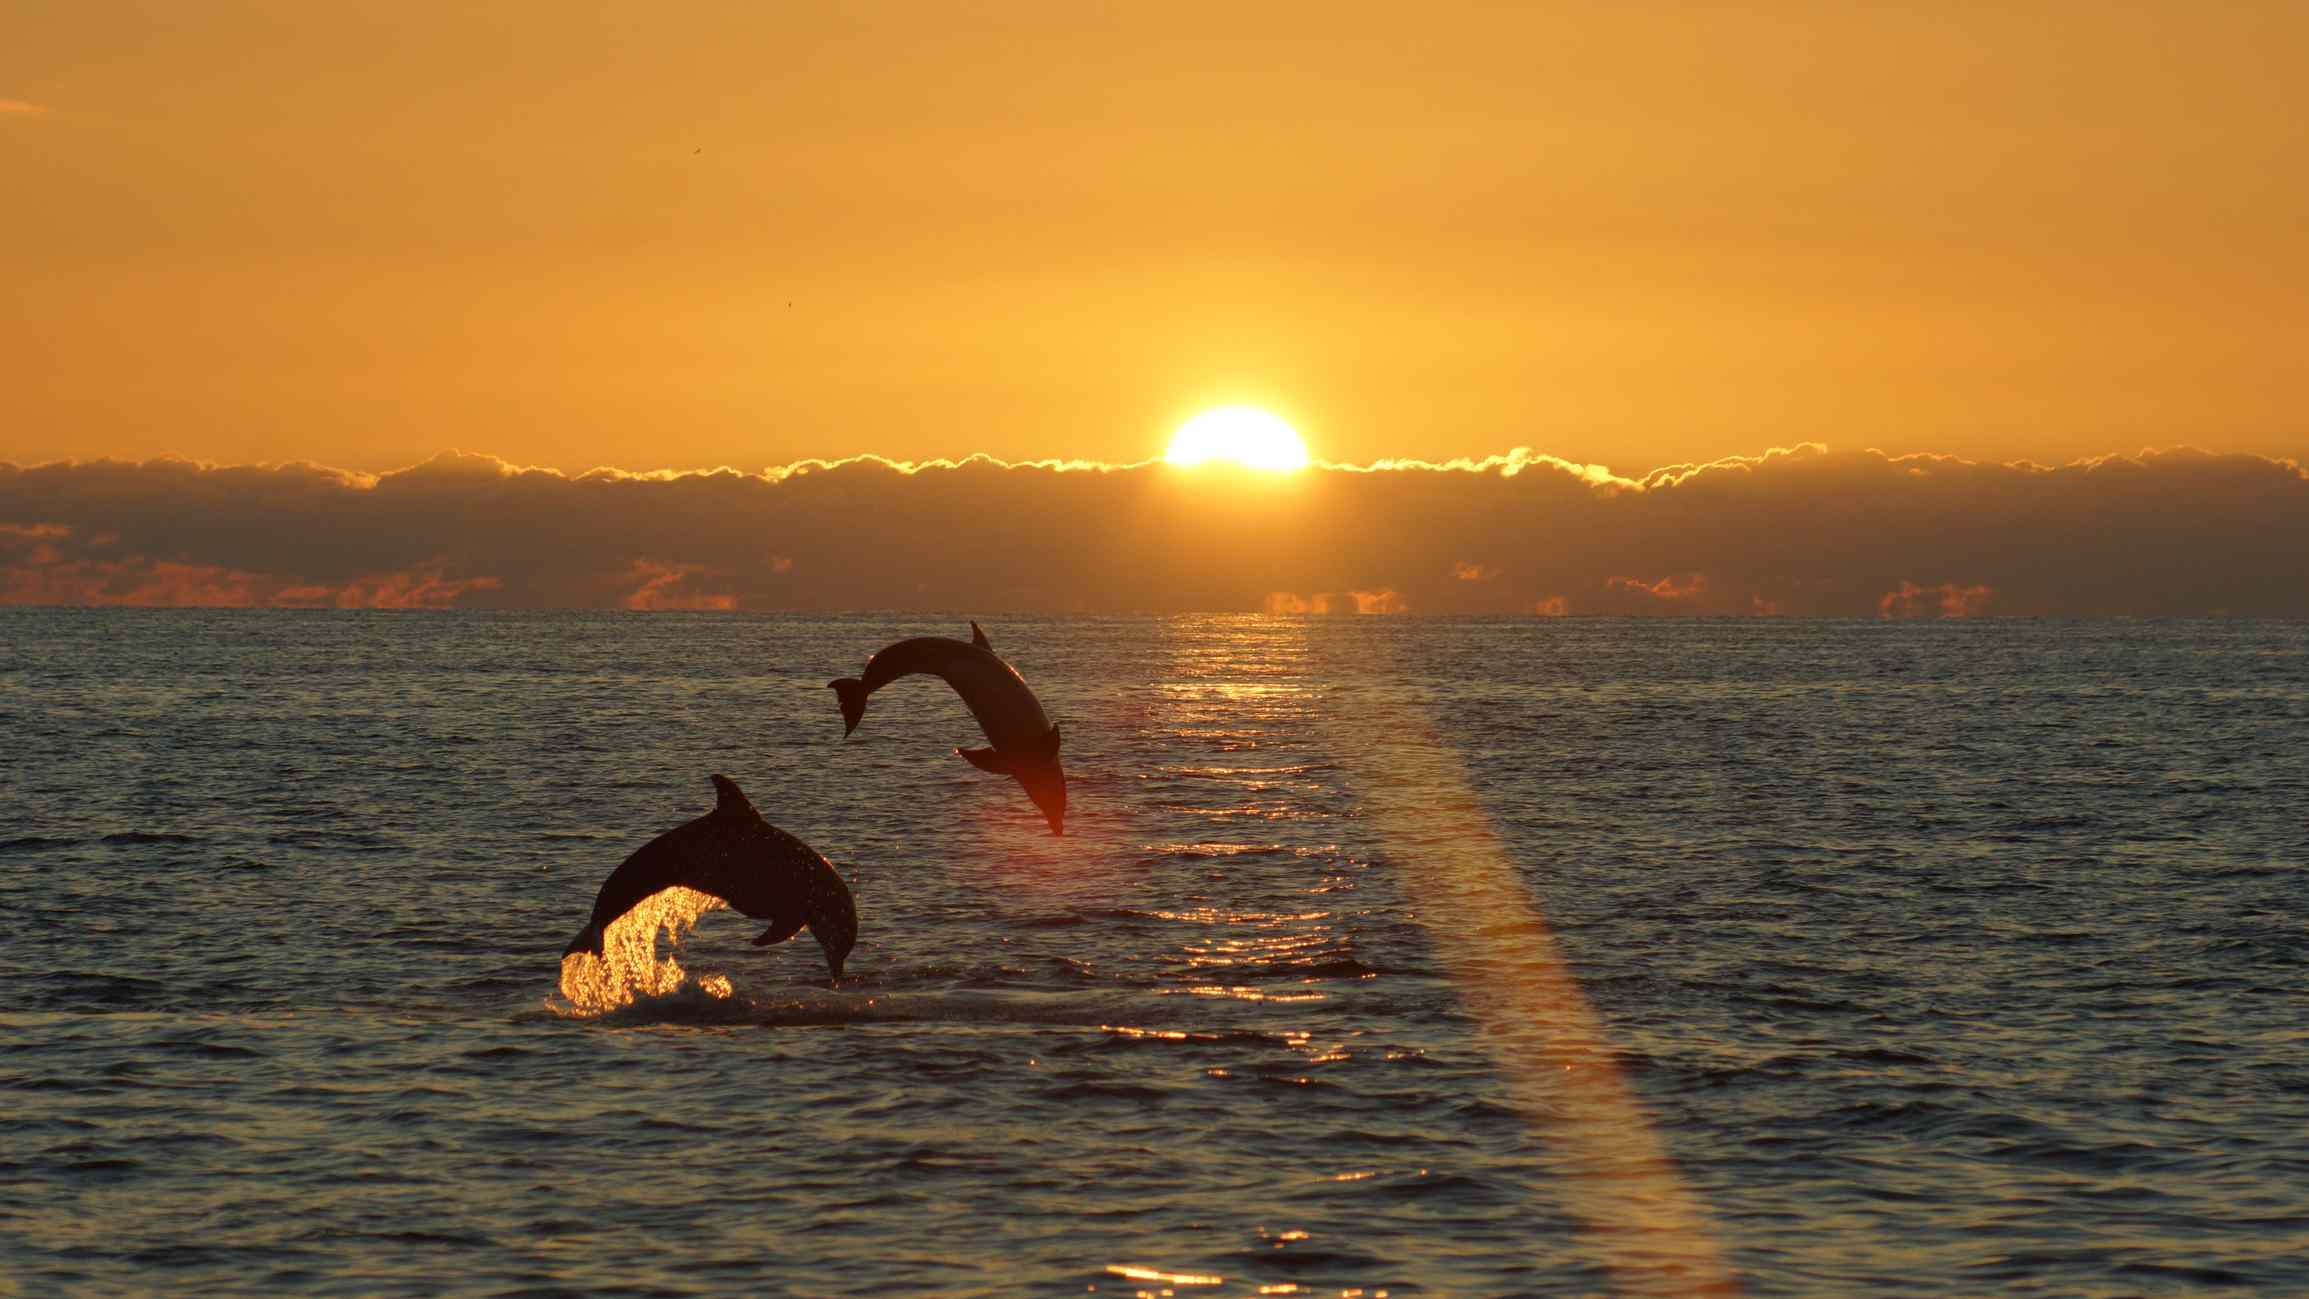 2 dolphins leaping at sunset near Sanibel Island, Florida